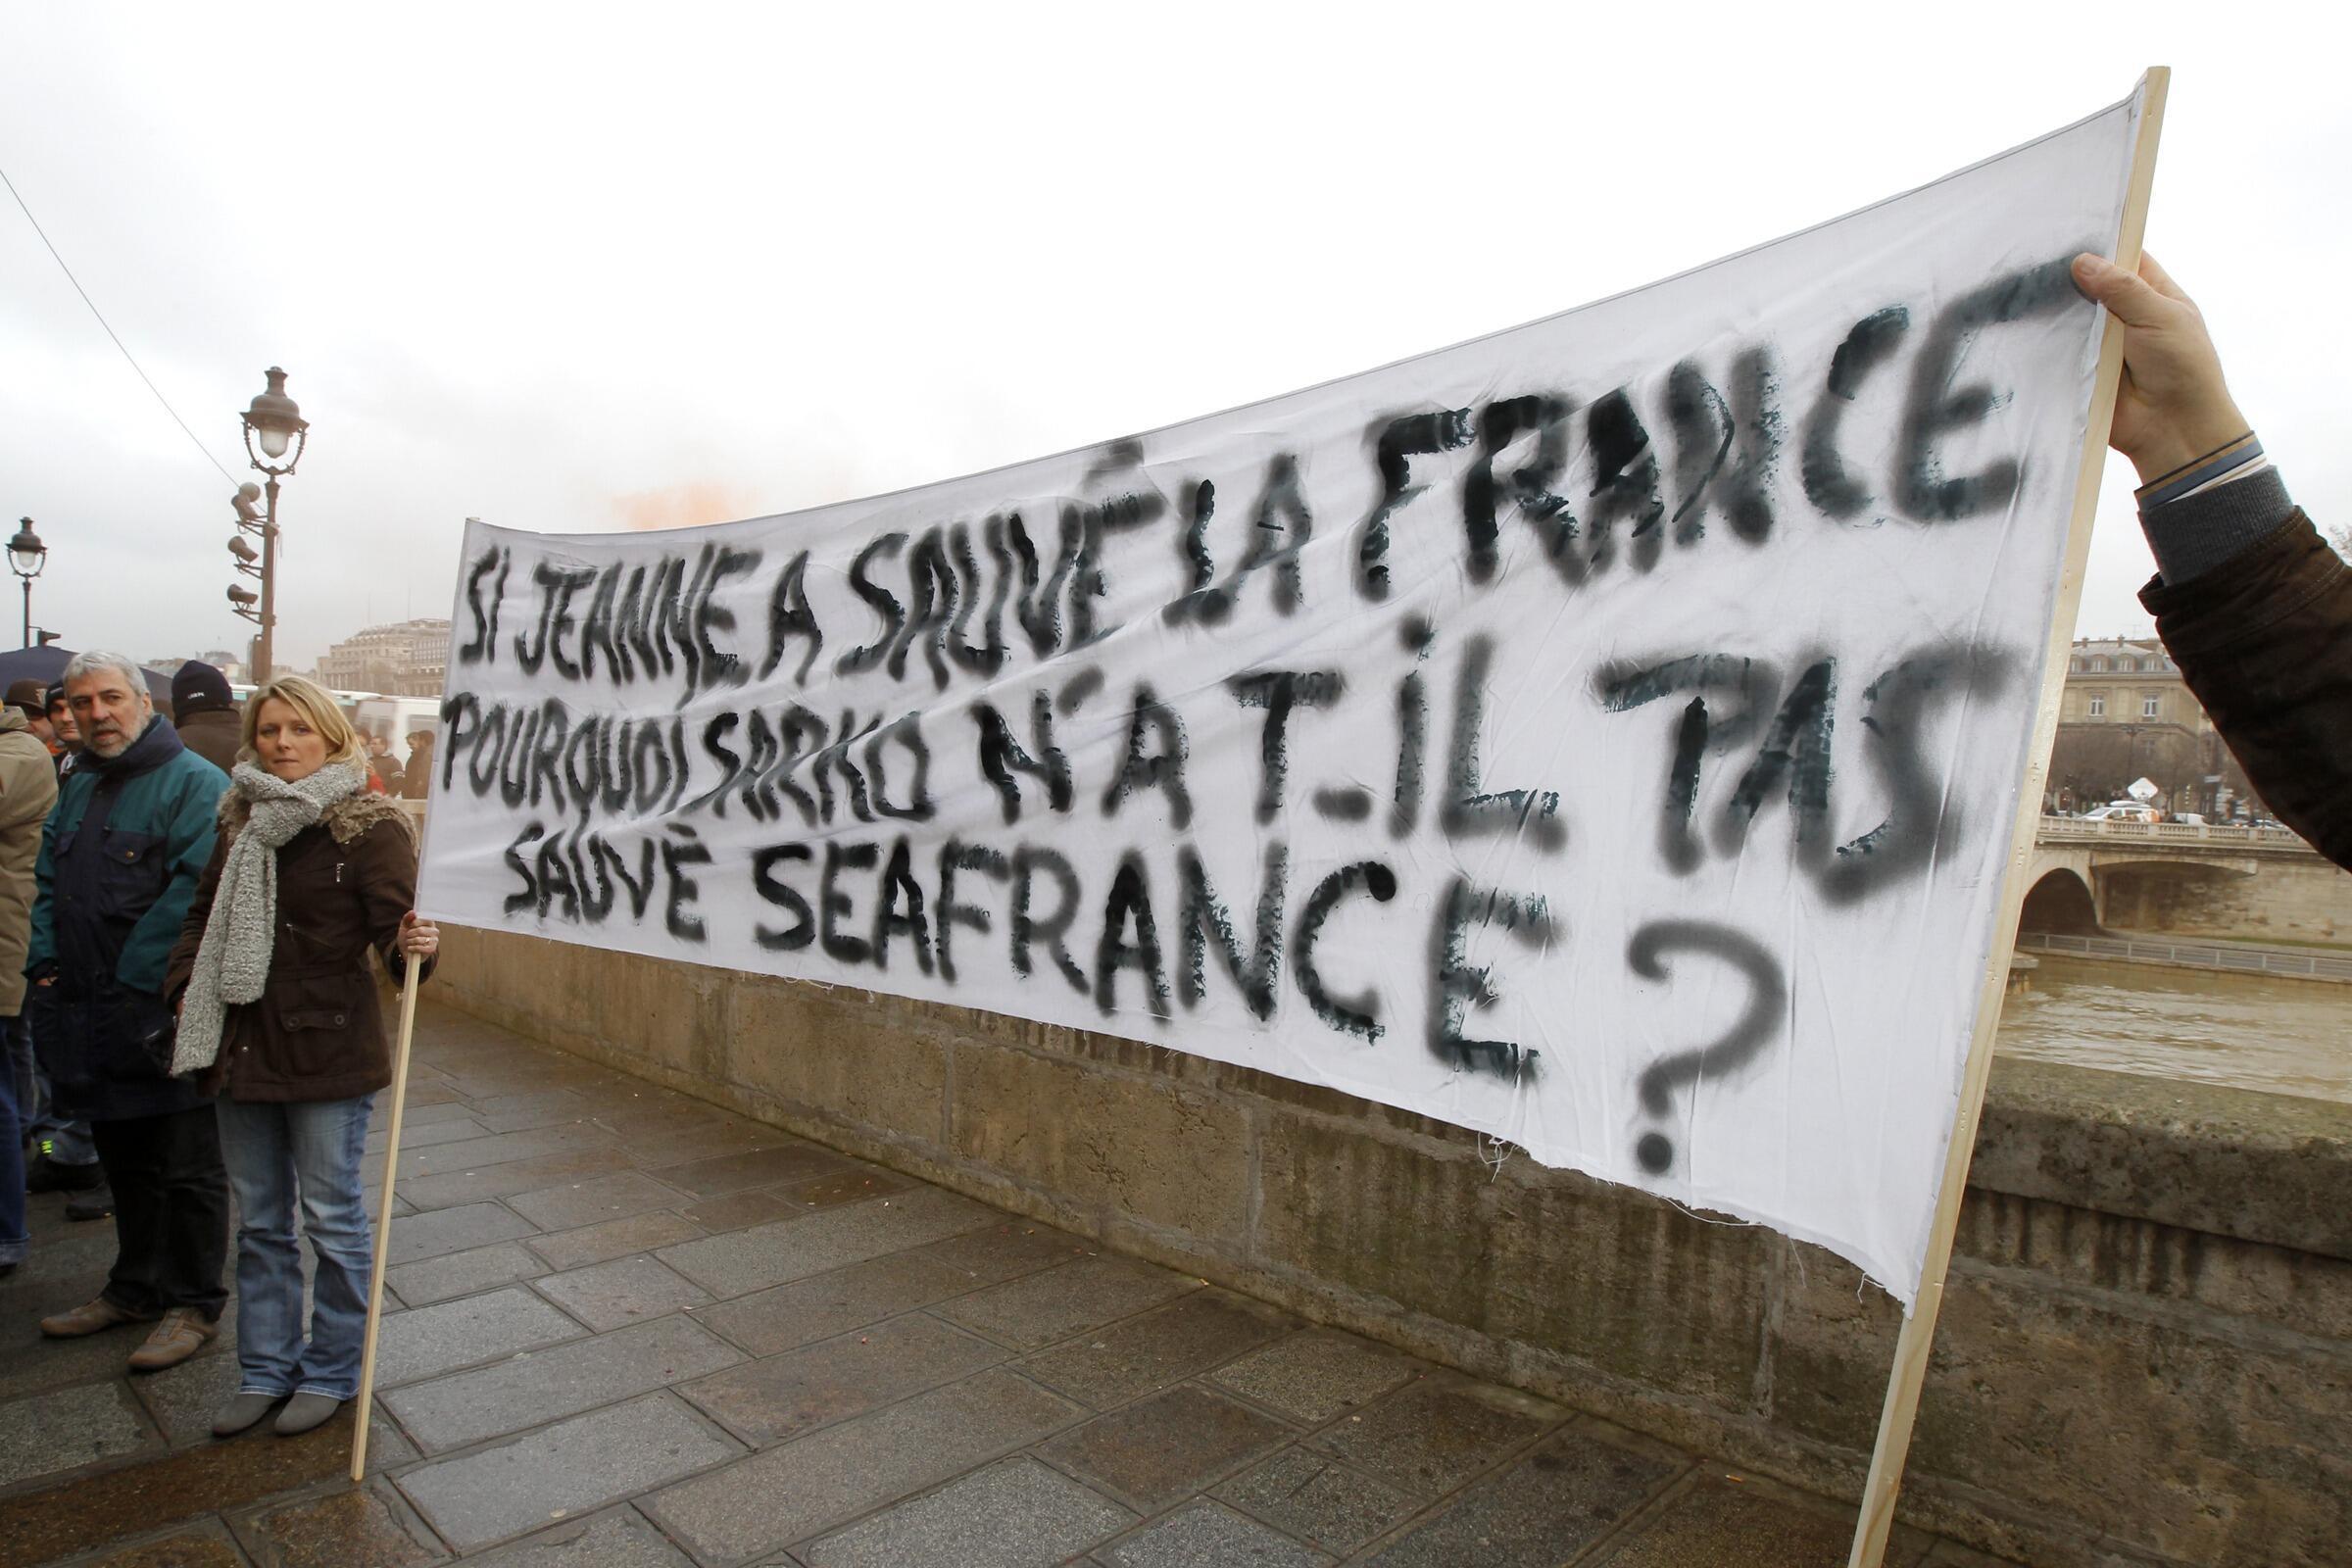 Работники SeaFrance пикетируют перед зданием Арбитражного суда Парижа 09/01/2012